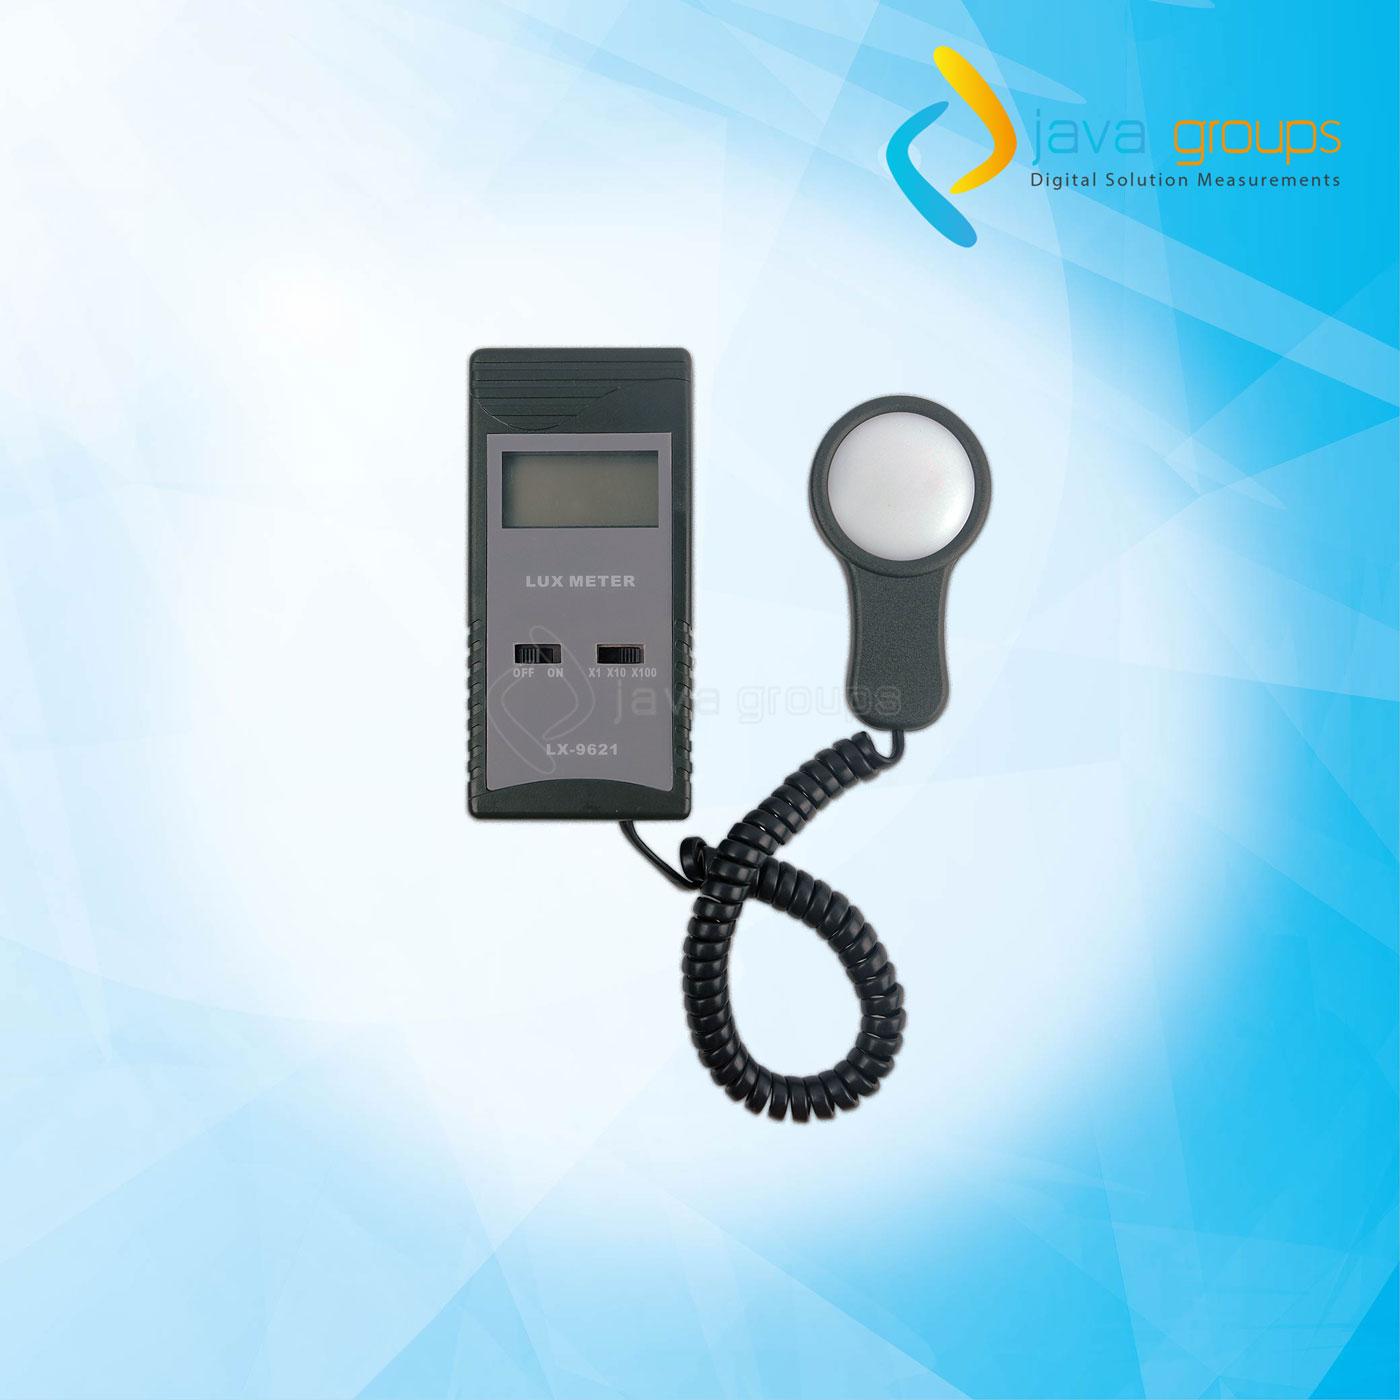 Alat Digital Ukur Intensitas Cahaya LX-9621